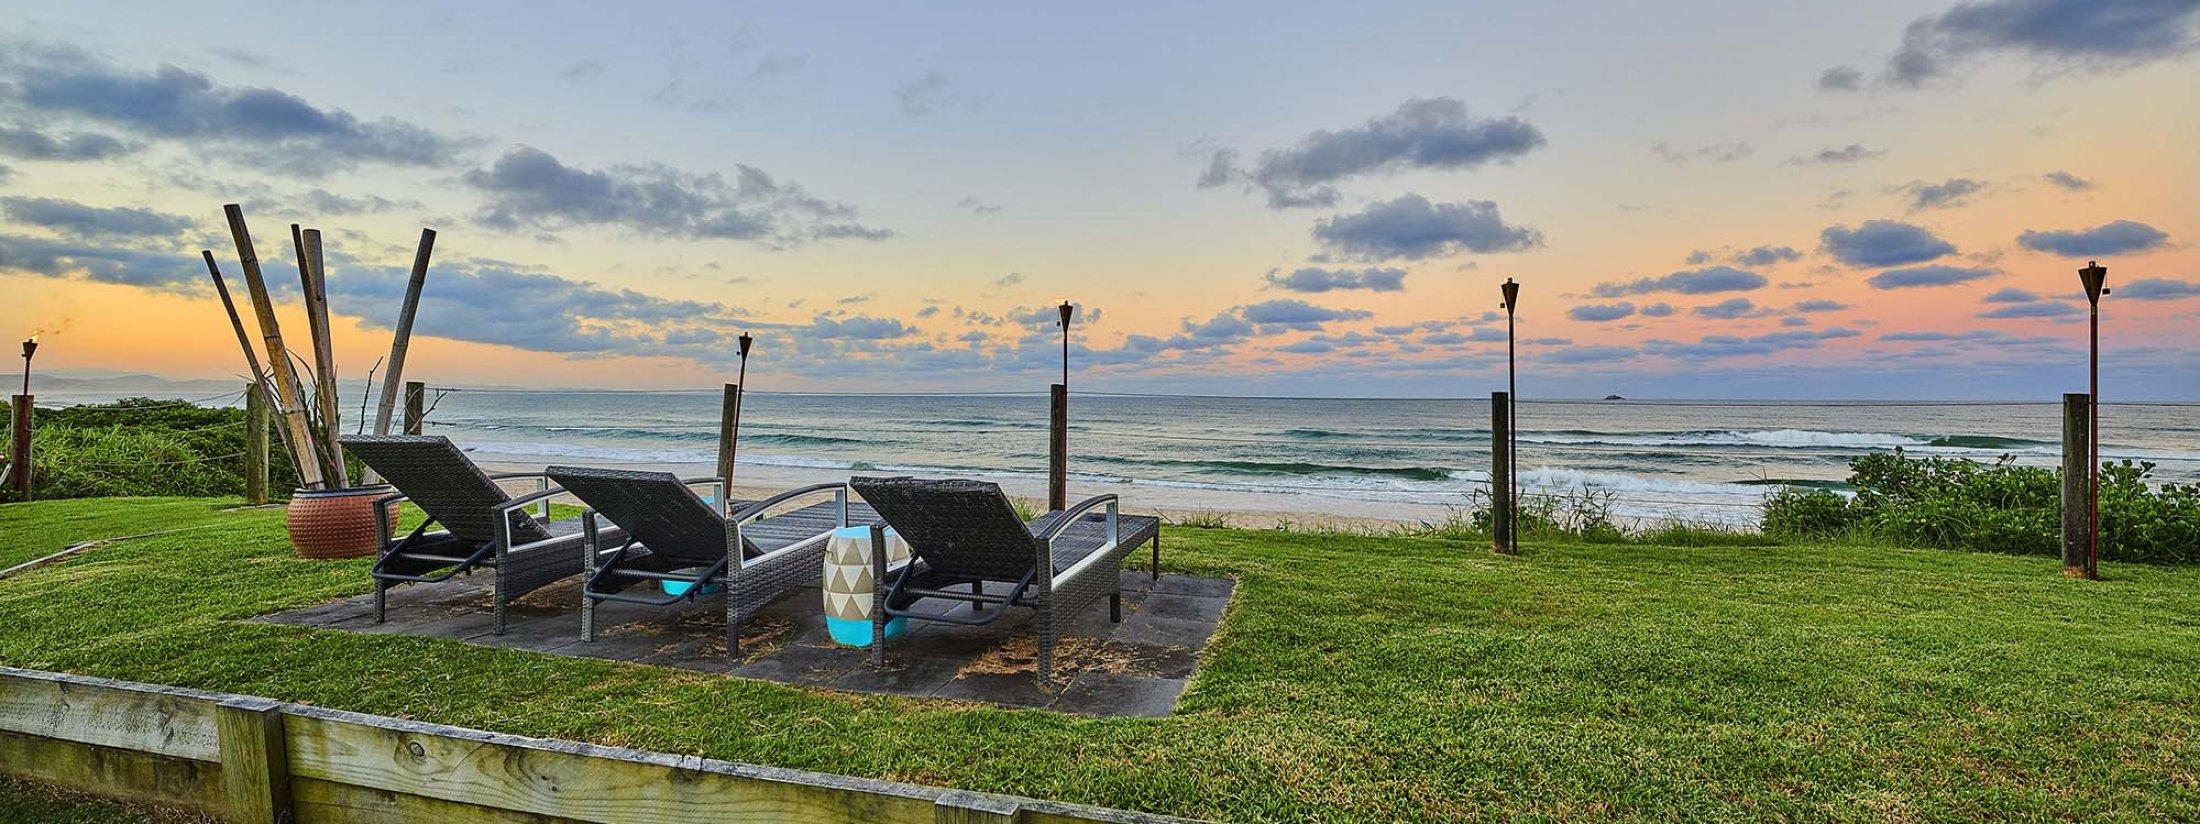 Belongil on The Beach - Byron Bay - Ocean View at Dusk